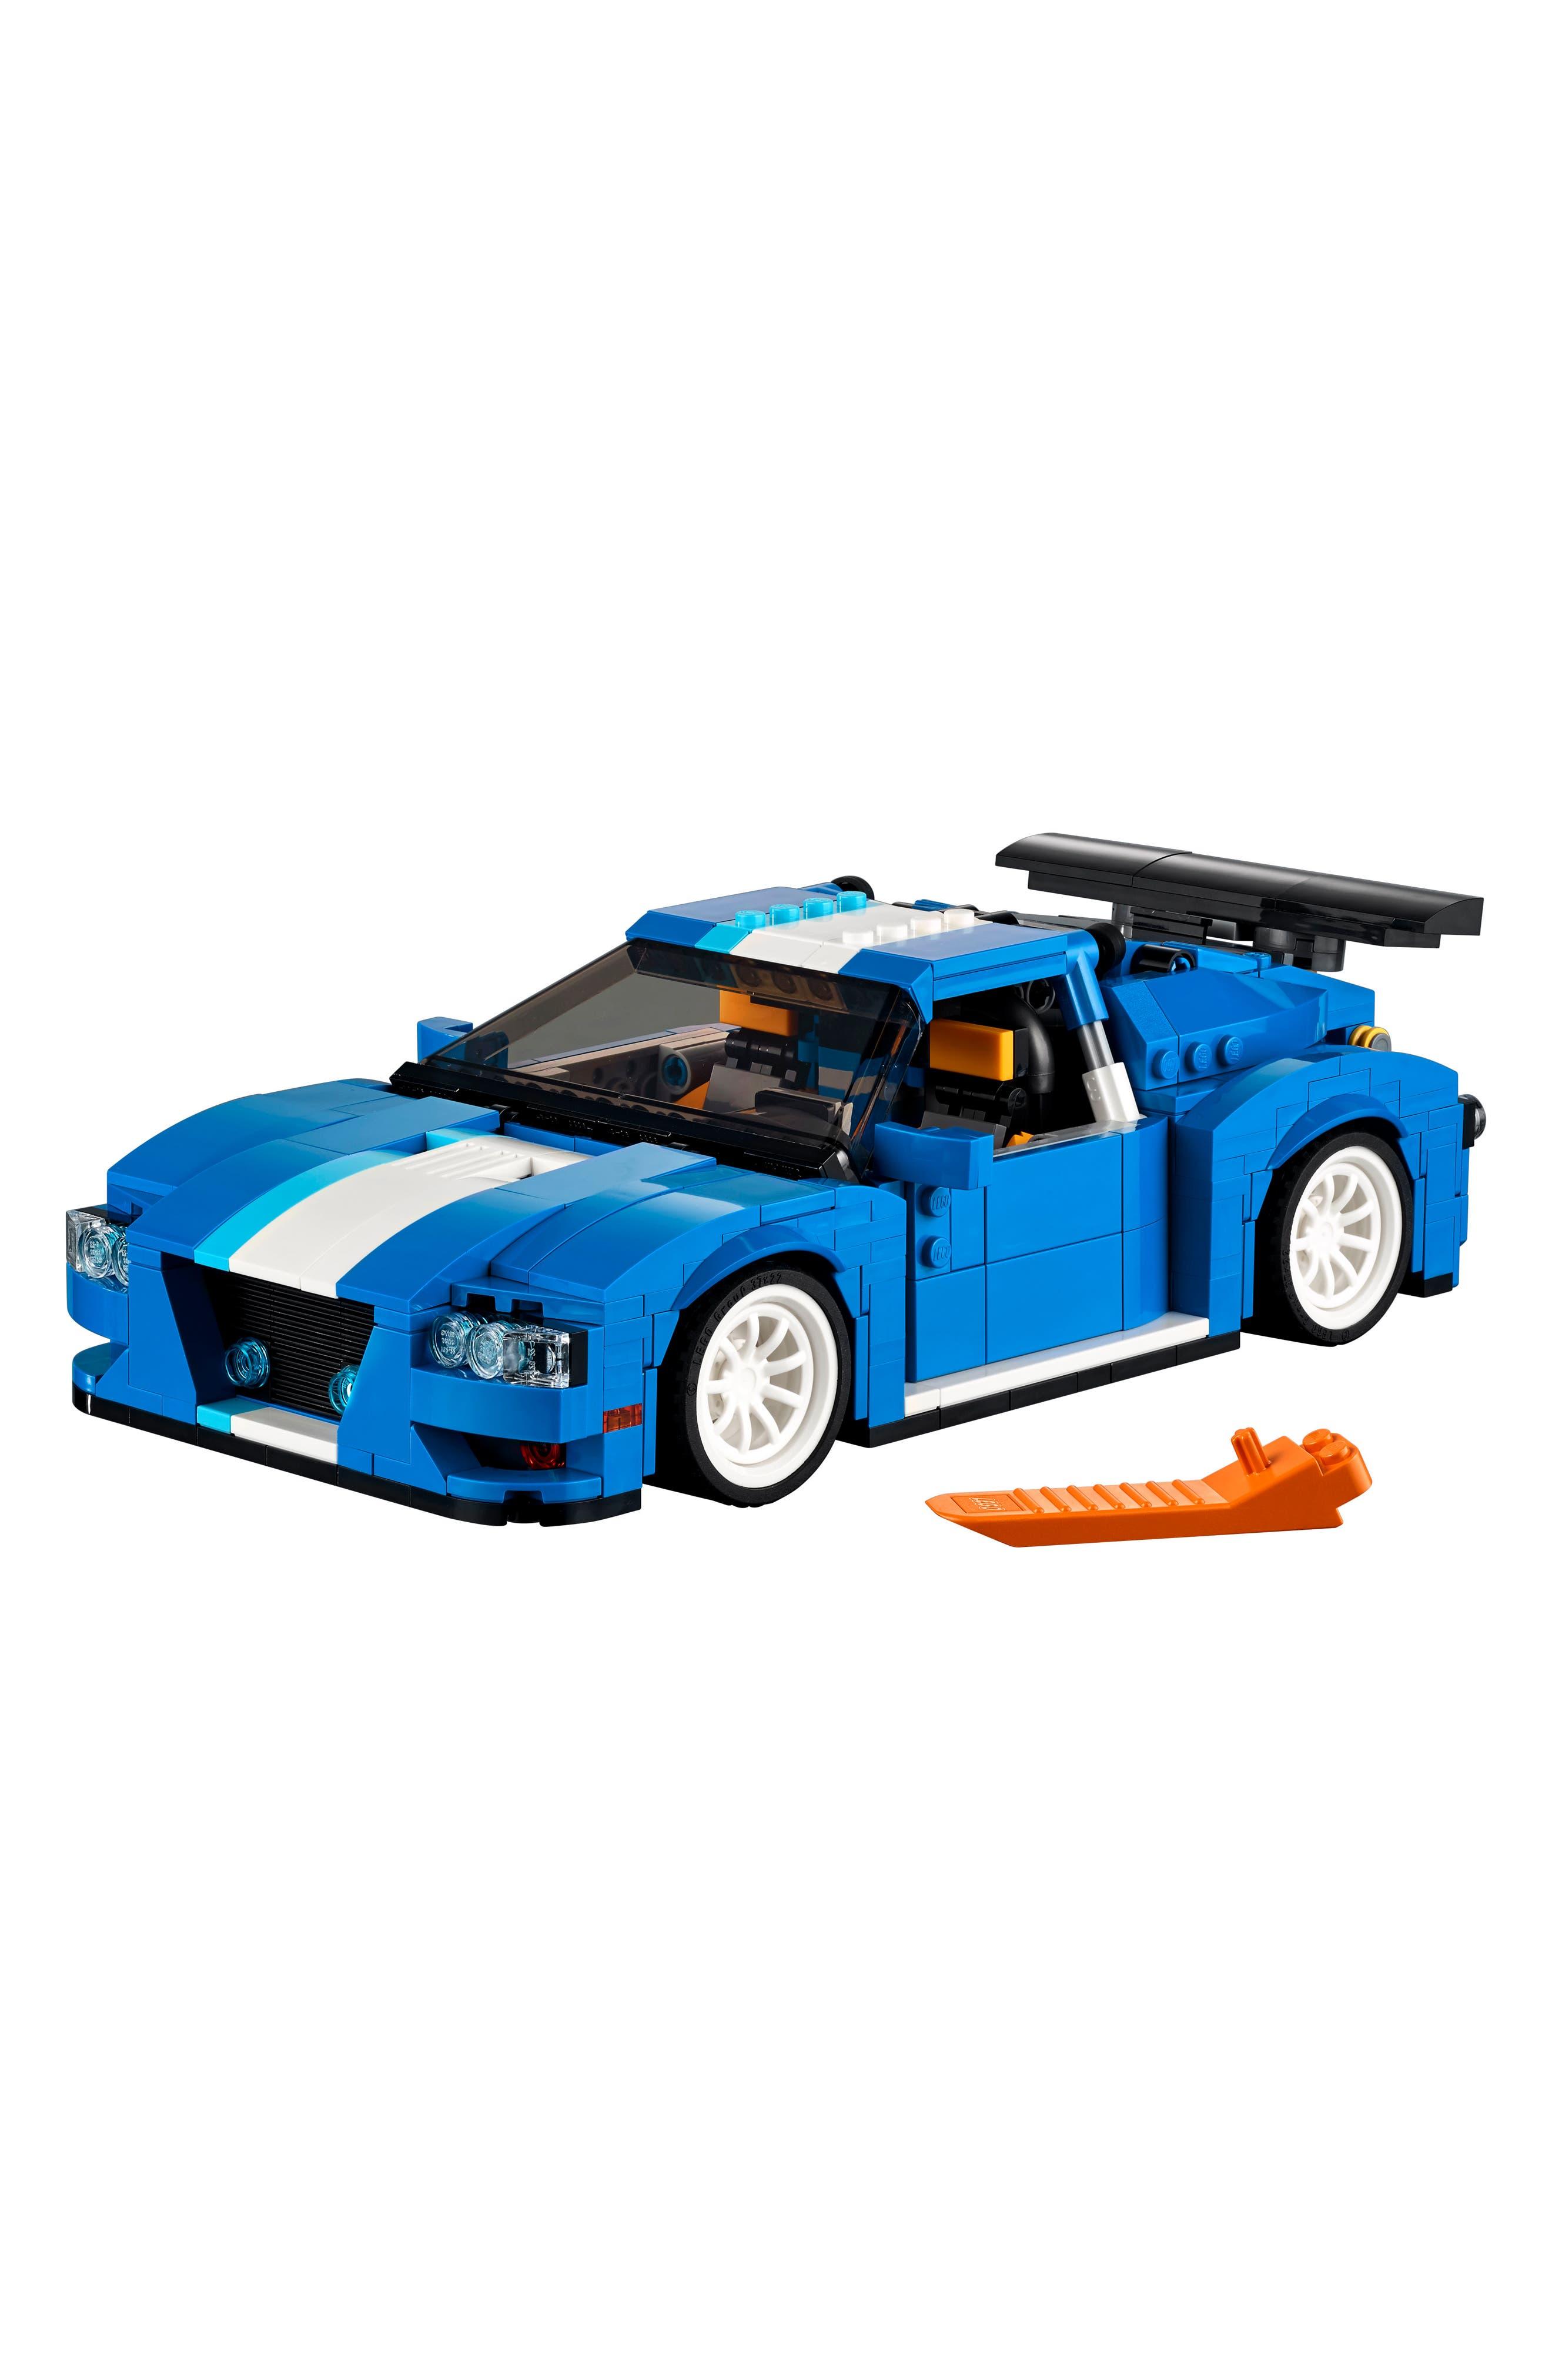 Creator 3-in-1 Turbo Track Racer - 31070,                             Alternate thumbnail 3, color,                             400